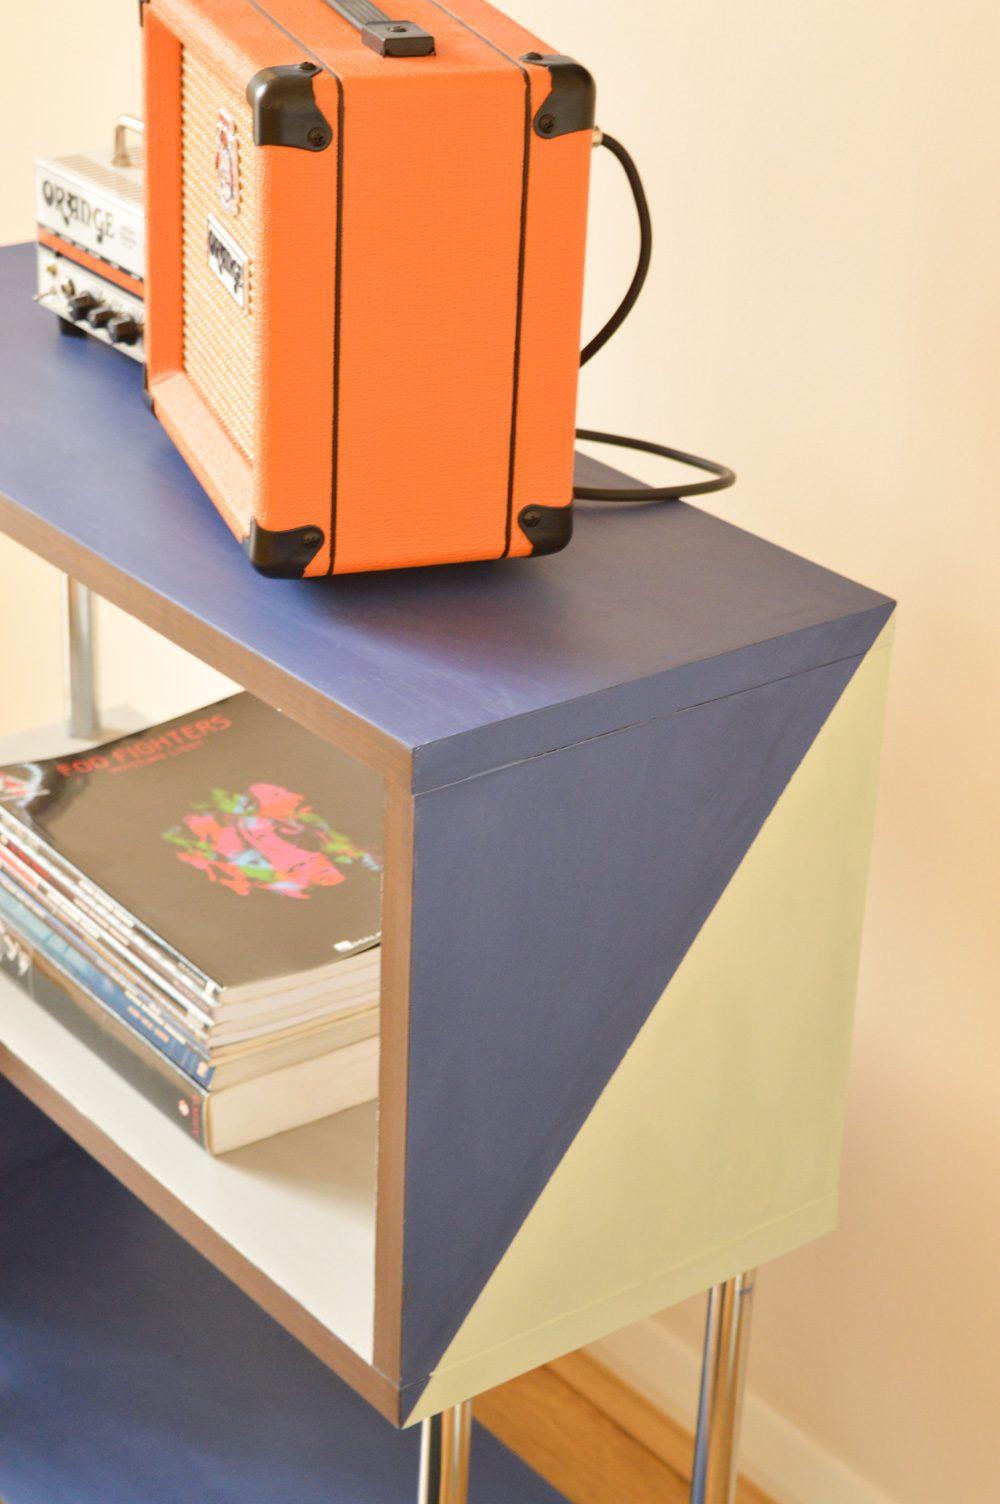 Rust Oleum Furniture Paint shelf makeover